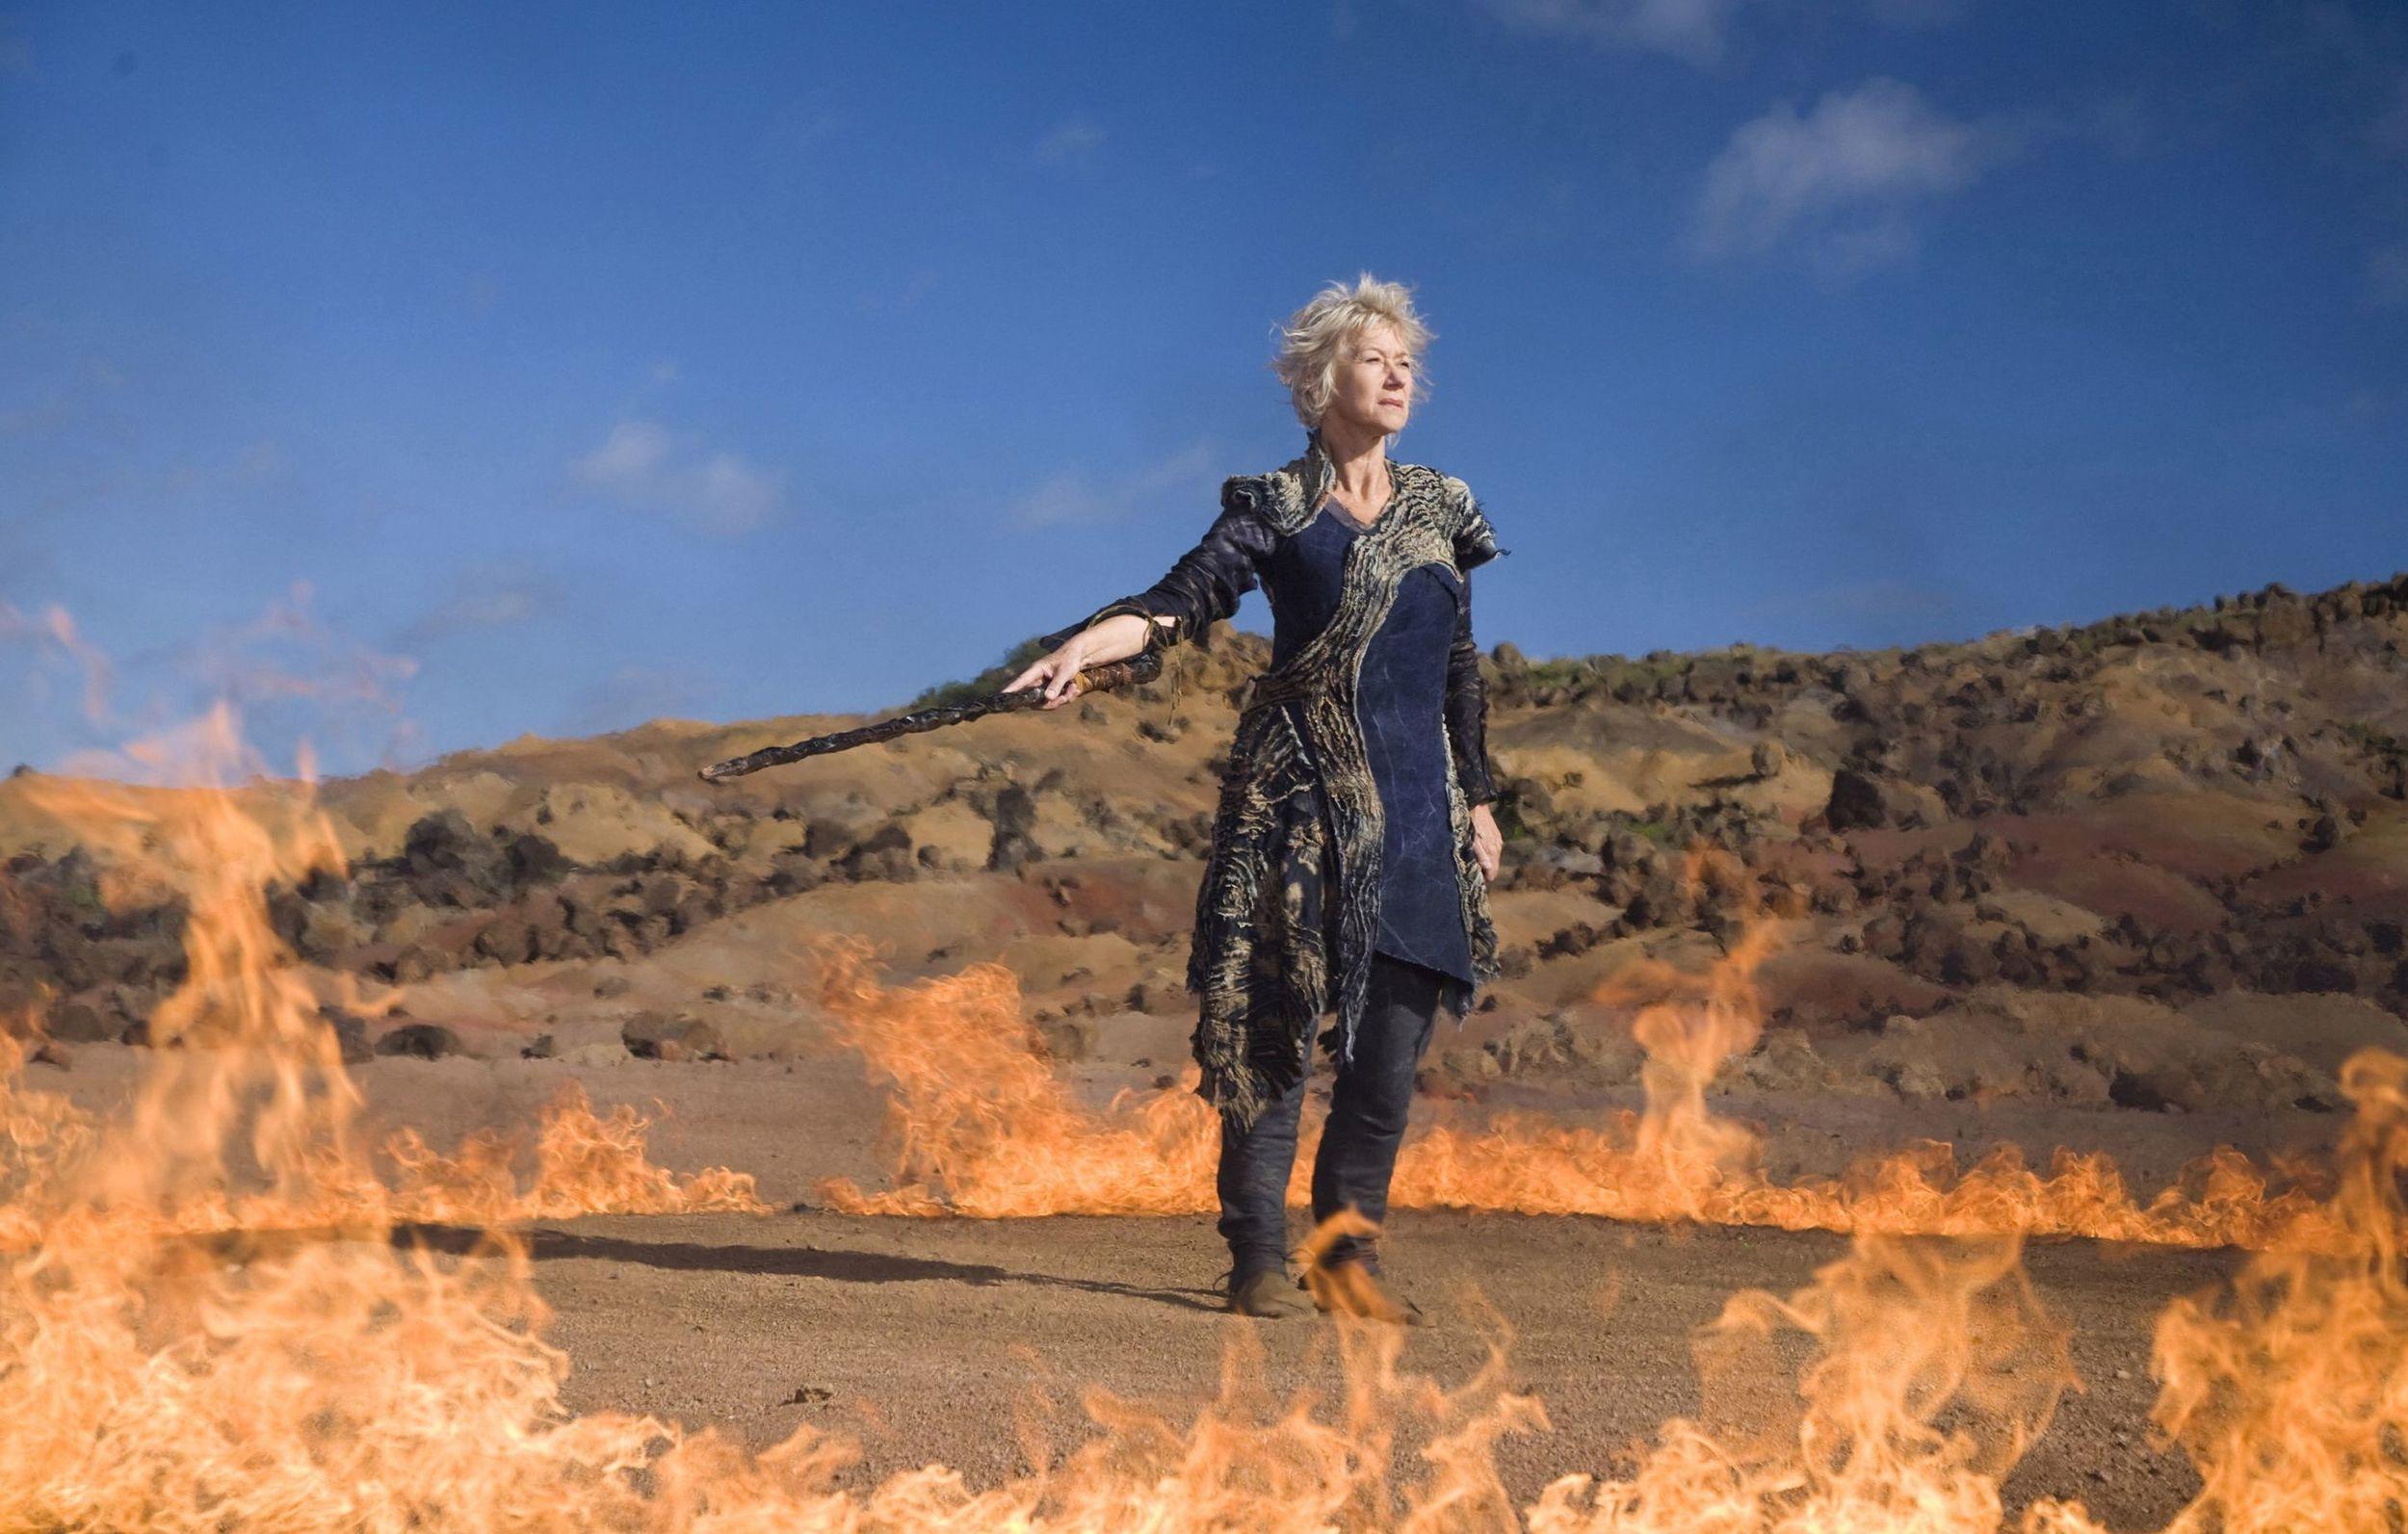 Helen Mirren as 'Prospera' in  The Tempest , directed by Julie Taymor (2010). Photo by Melinda Sue.